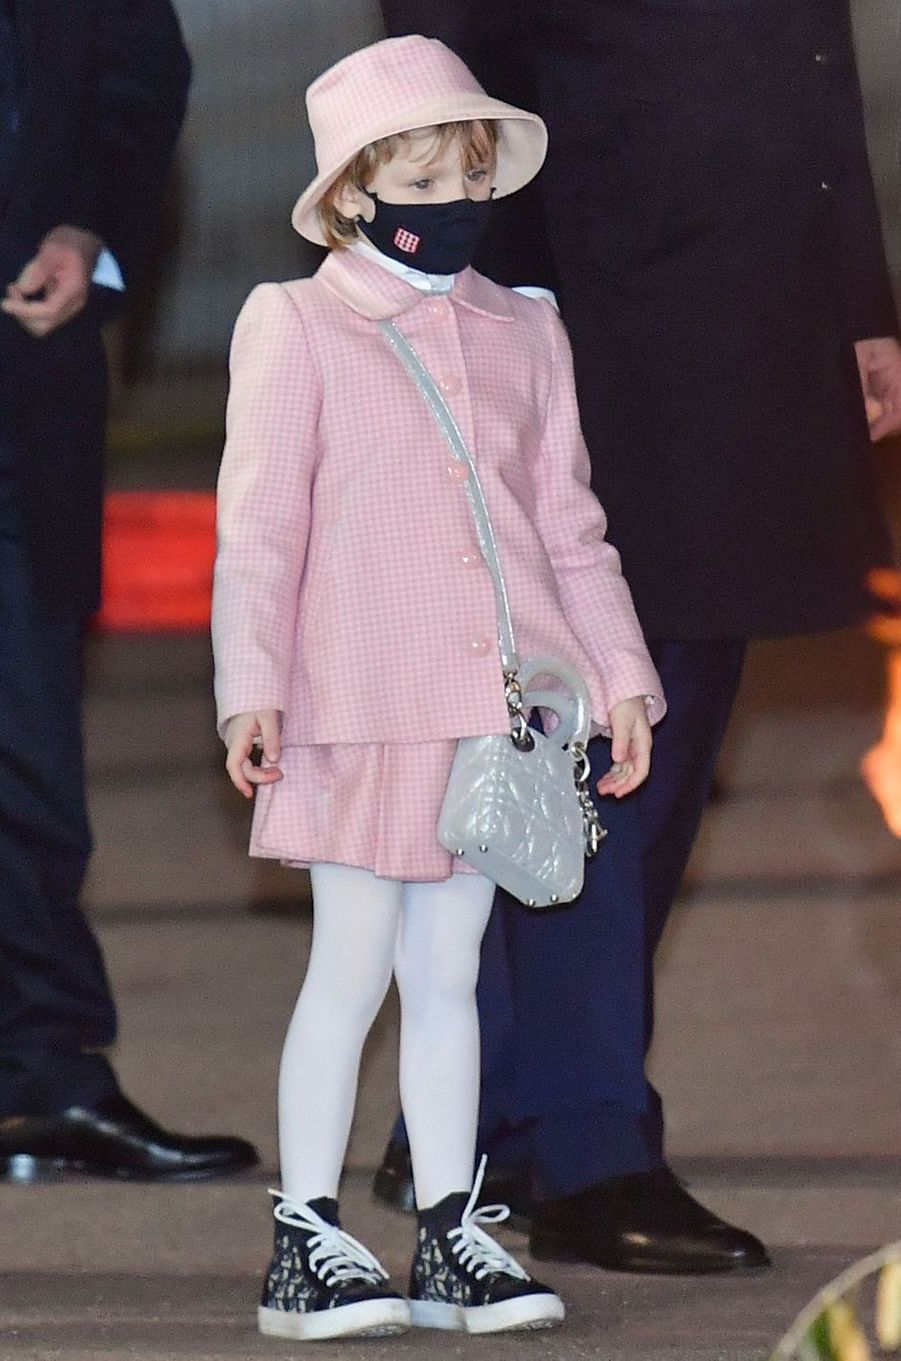 La princesse Gabriella de Monaco en Dior de la tête aux pieds, à Monaco le 26 janvier 2021